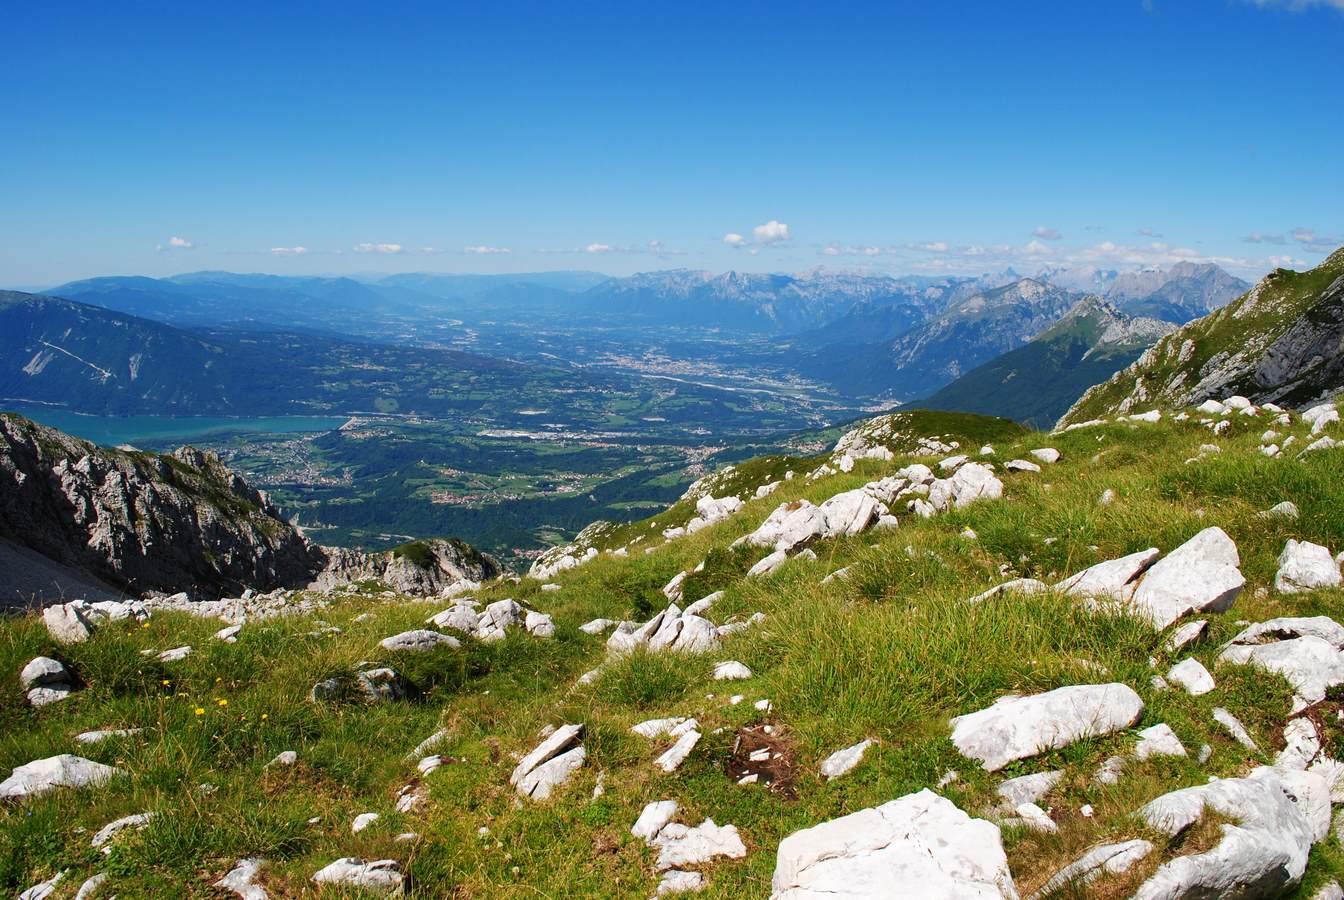 panorama-dal-bivacco-toffolon-trekking-in-alpago